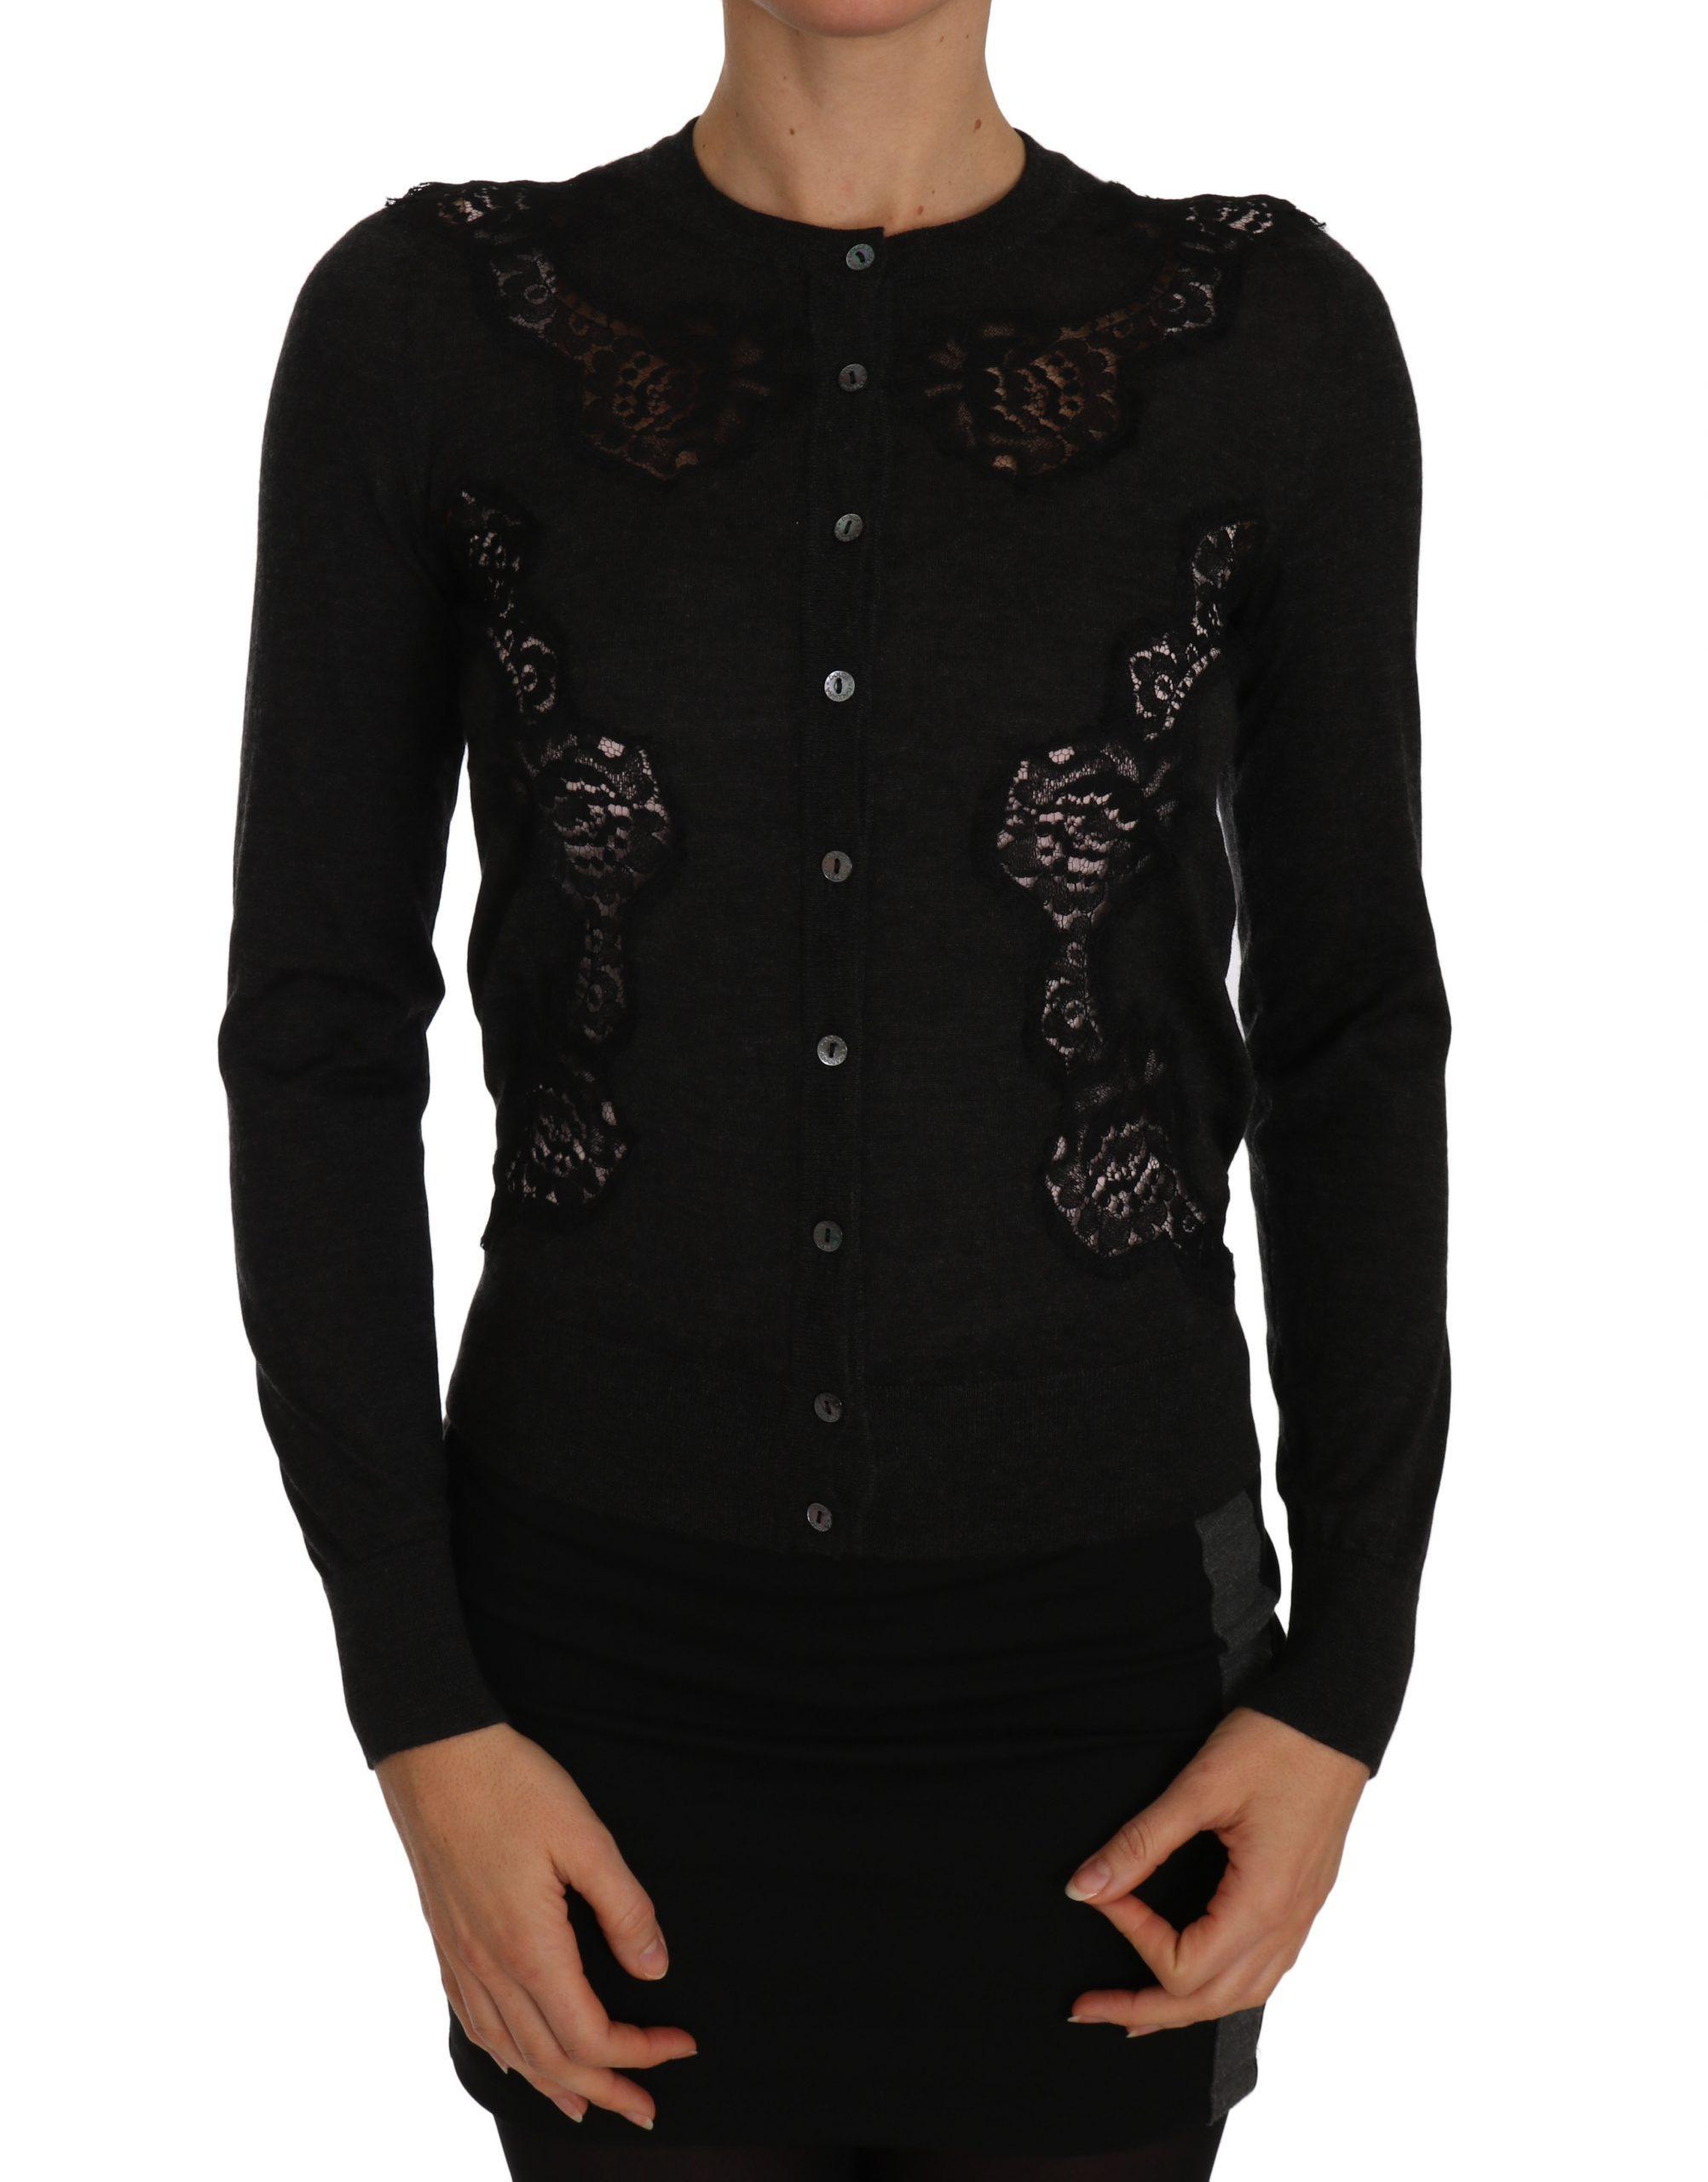 Dolce & Gabbana Women's Cashmere Lace Button Up Cardigan Gray TSH2258 - IT38 XS